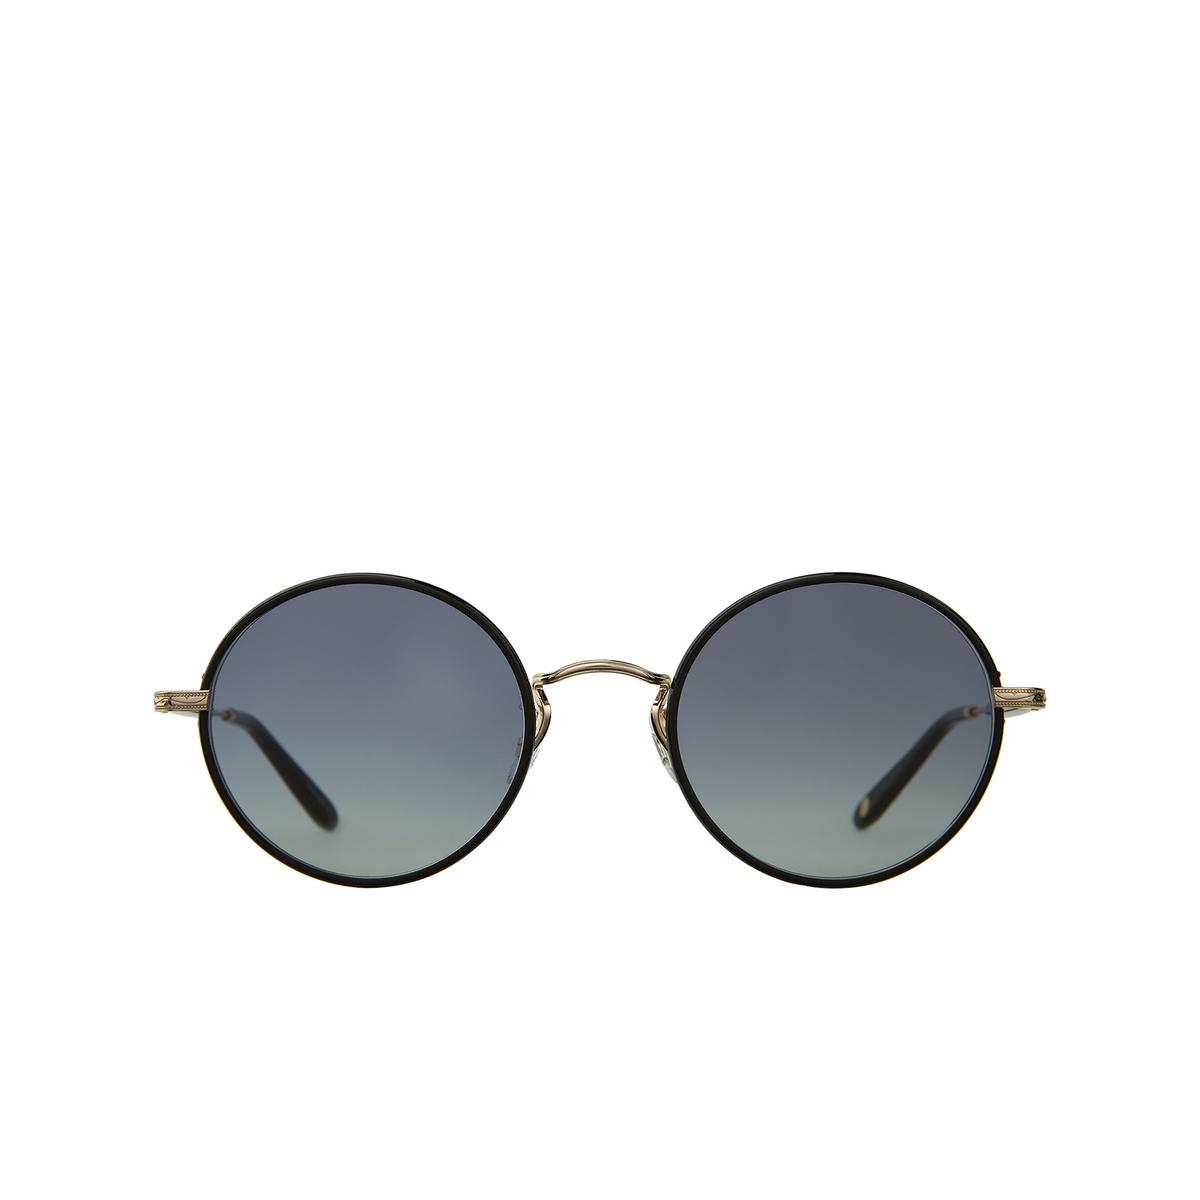 Garrett Leight® Round Sunglasses: Fonda Sun color Black - Gold Bk-g-bk/swpg - front view.